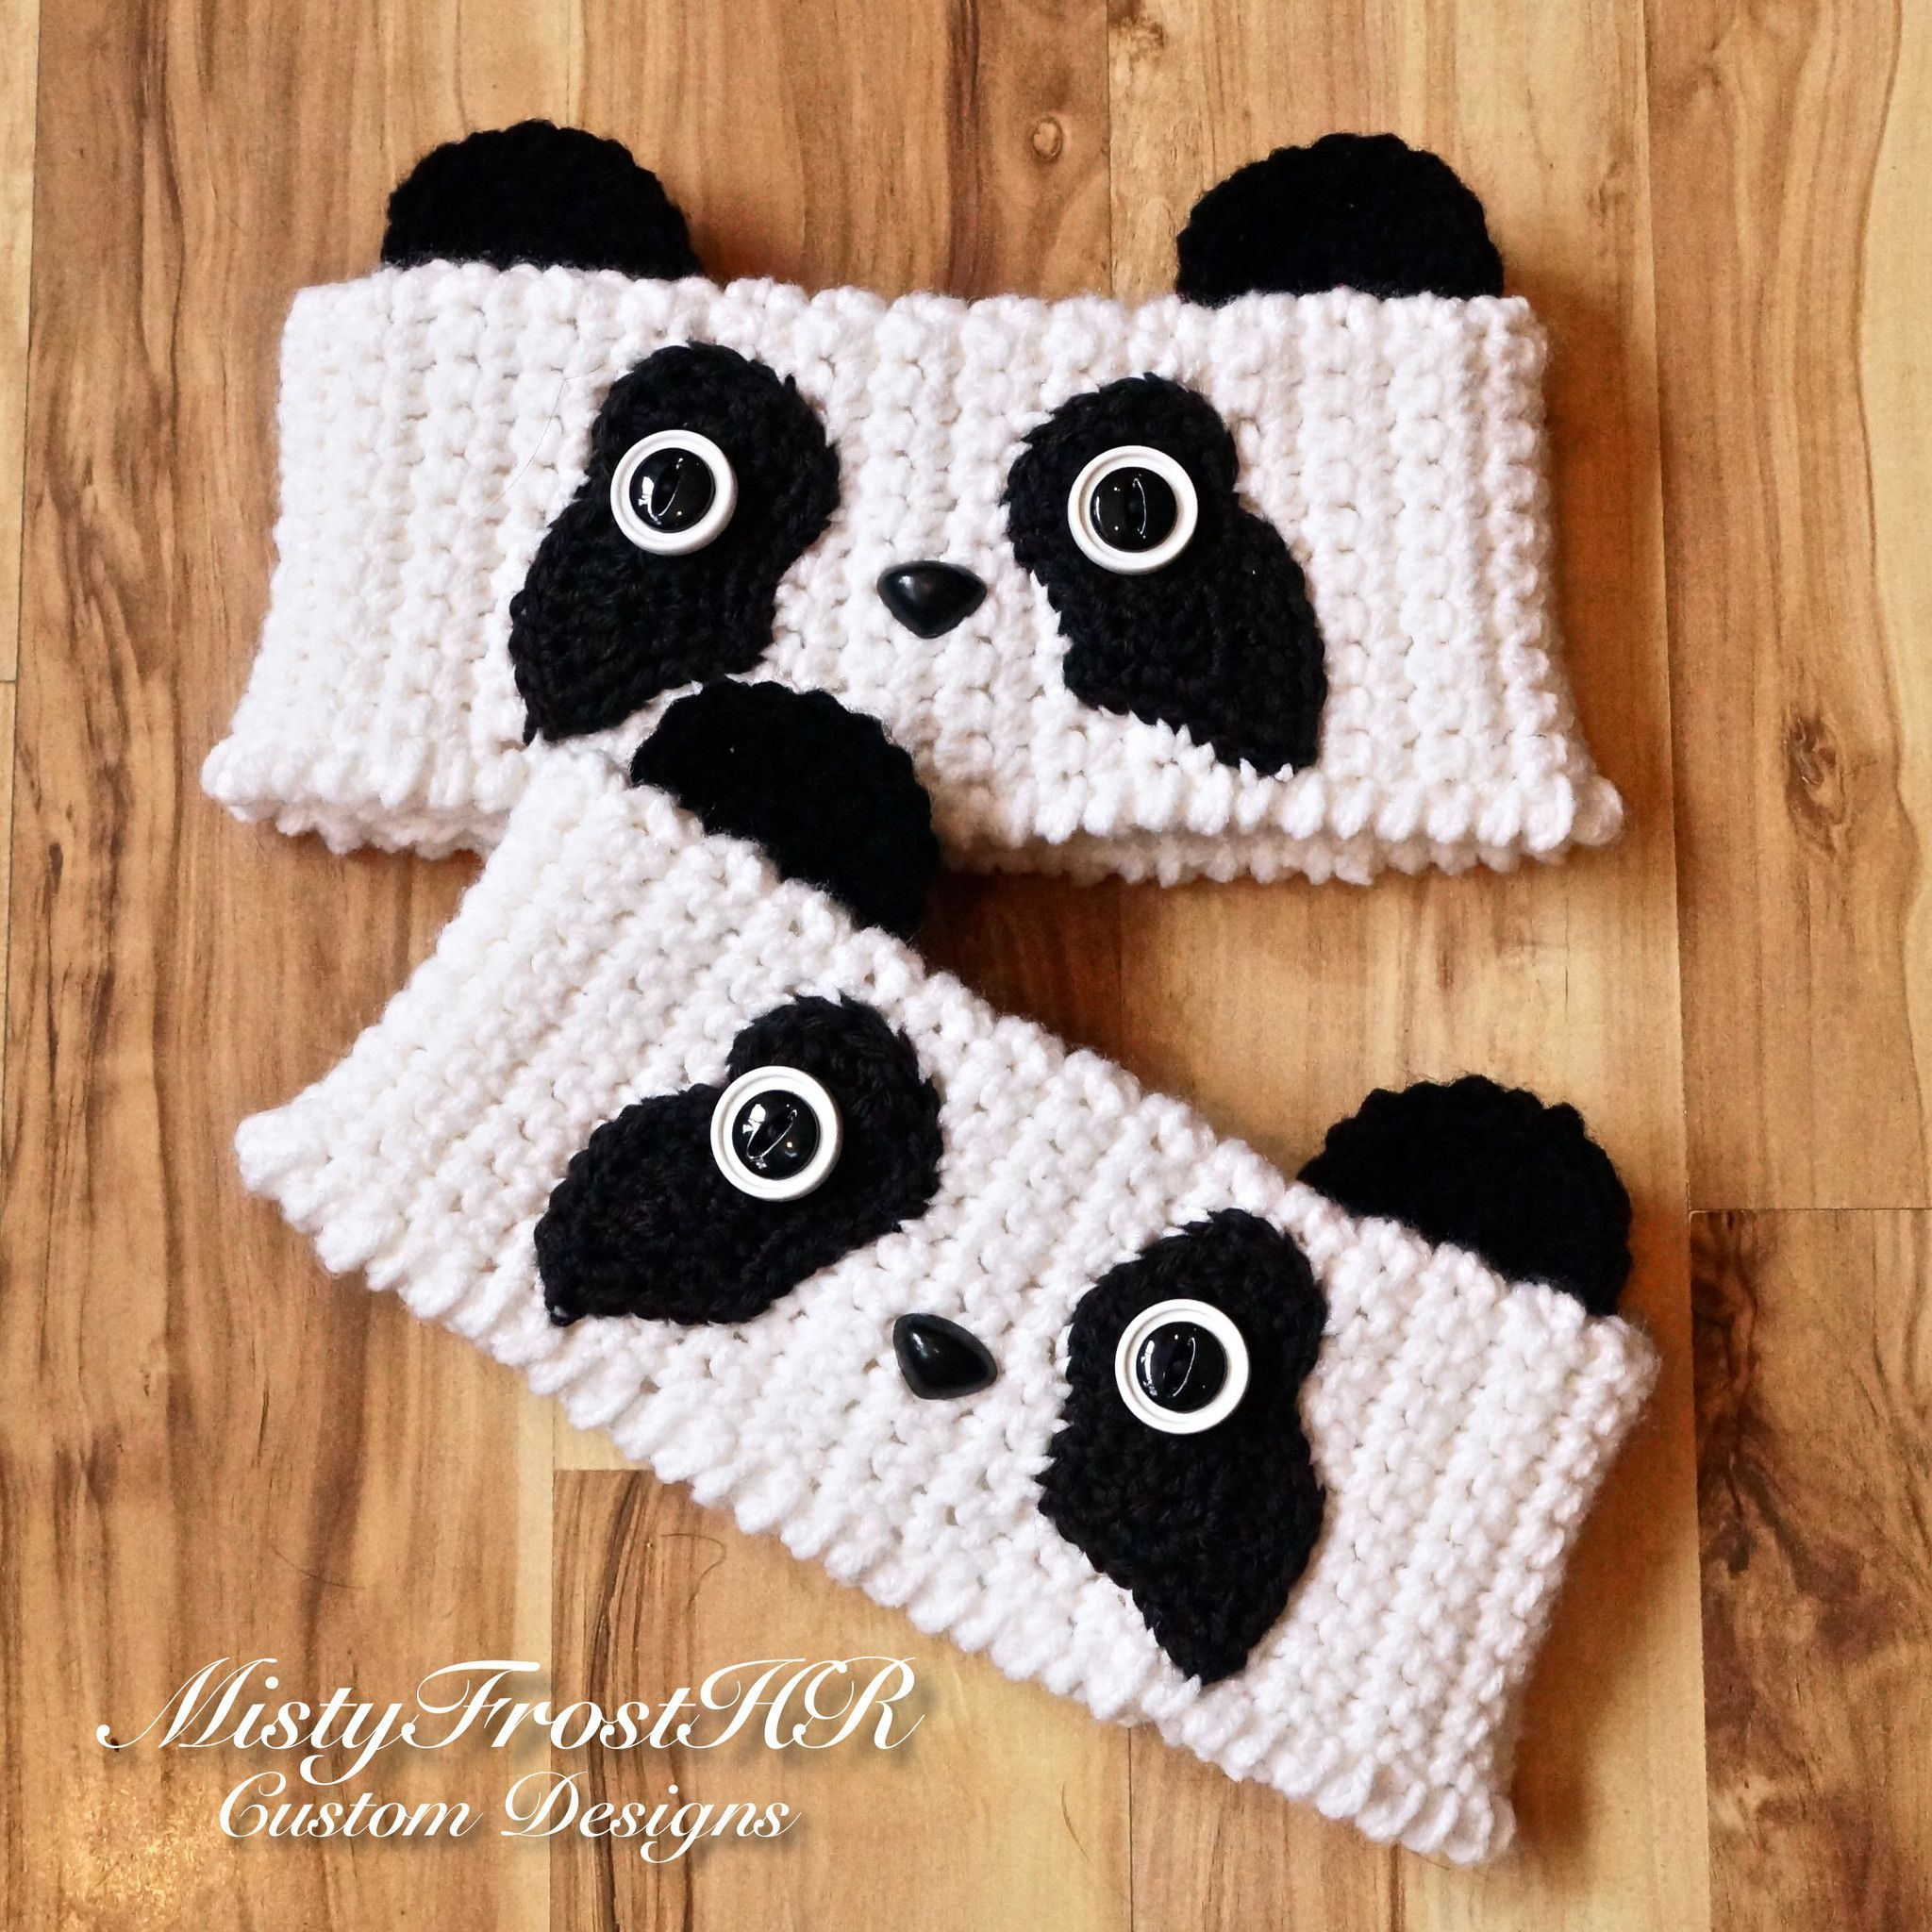 Crochet Perfectly Panda Bear Boot Cuff Toppers | Stiefel, Häkeln und ...